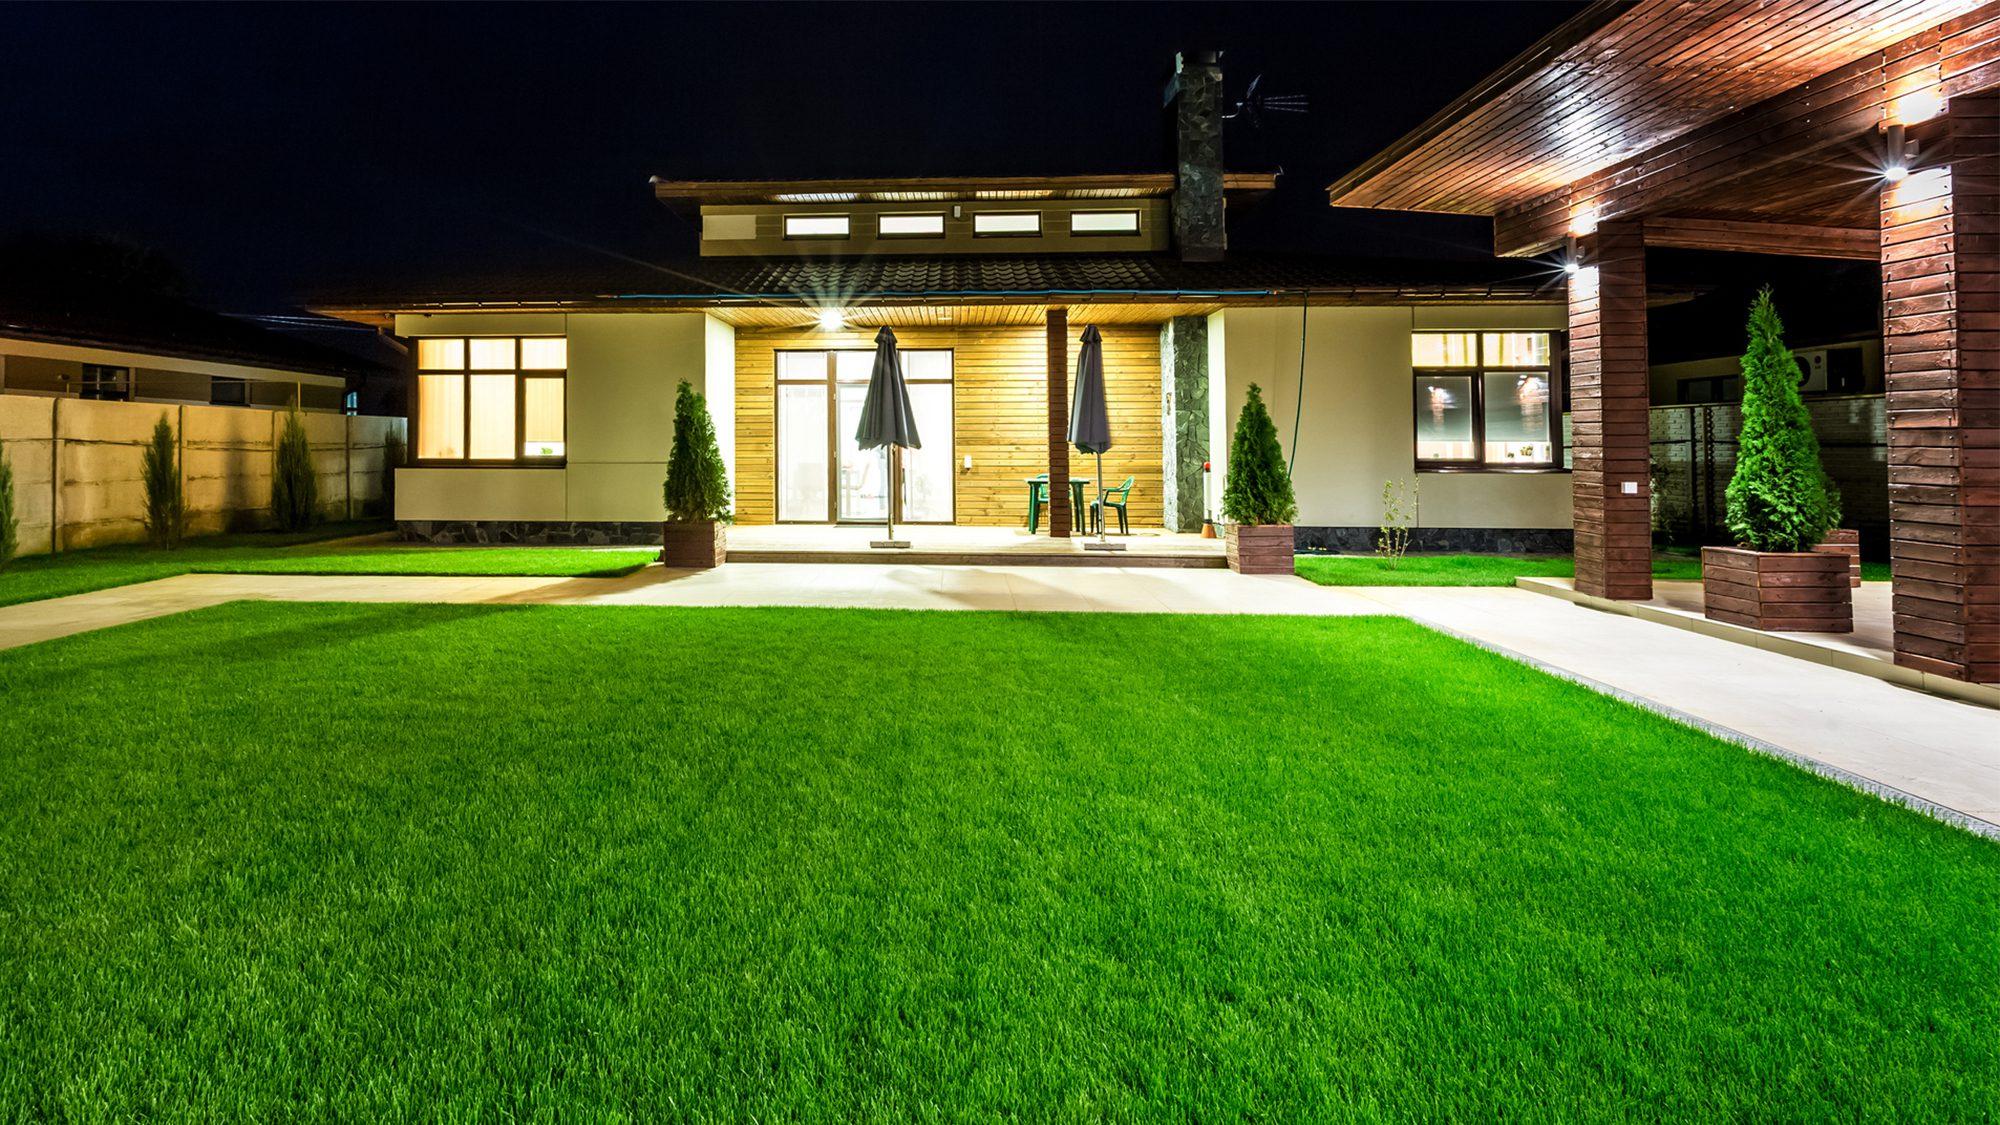 Outdoor Lighting Ideas For Your Porch Backyard Or Driveway Realtor Com